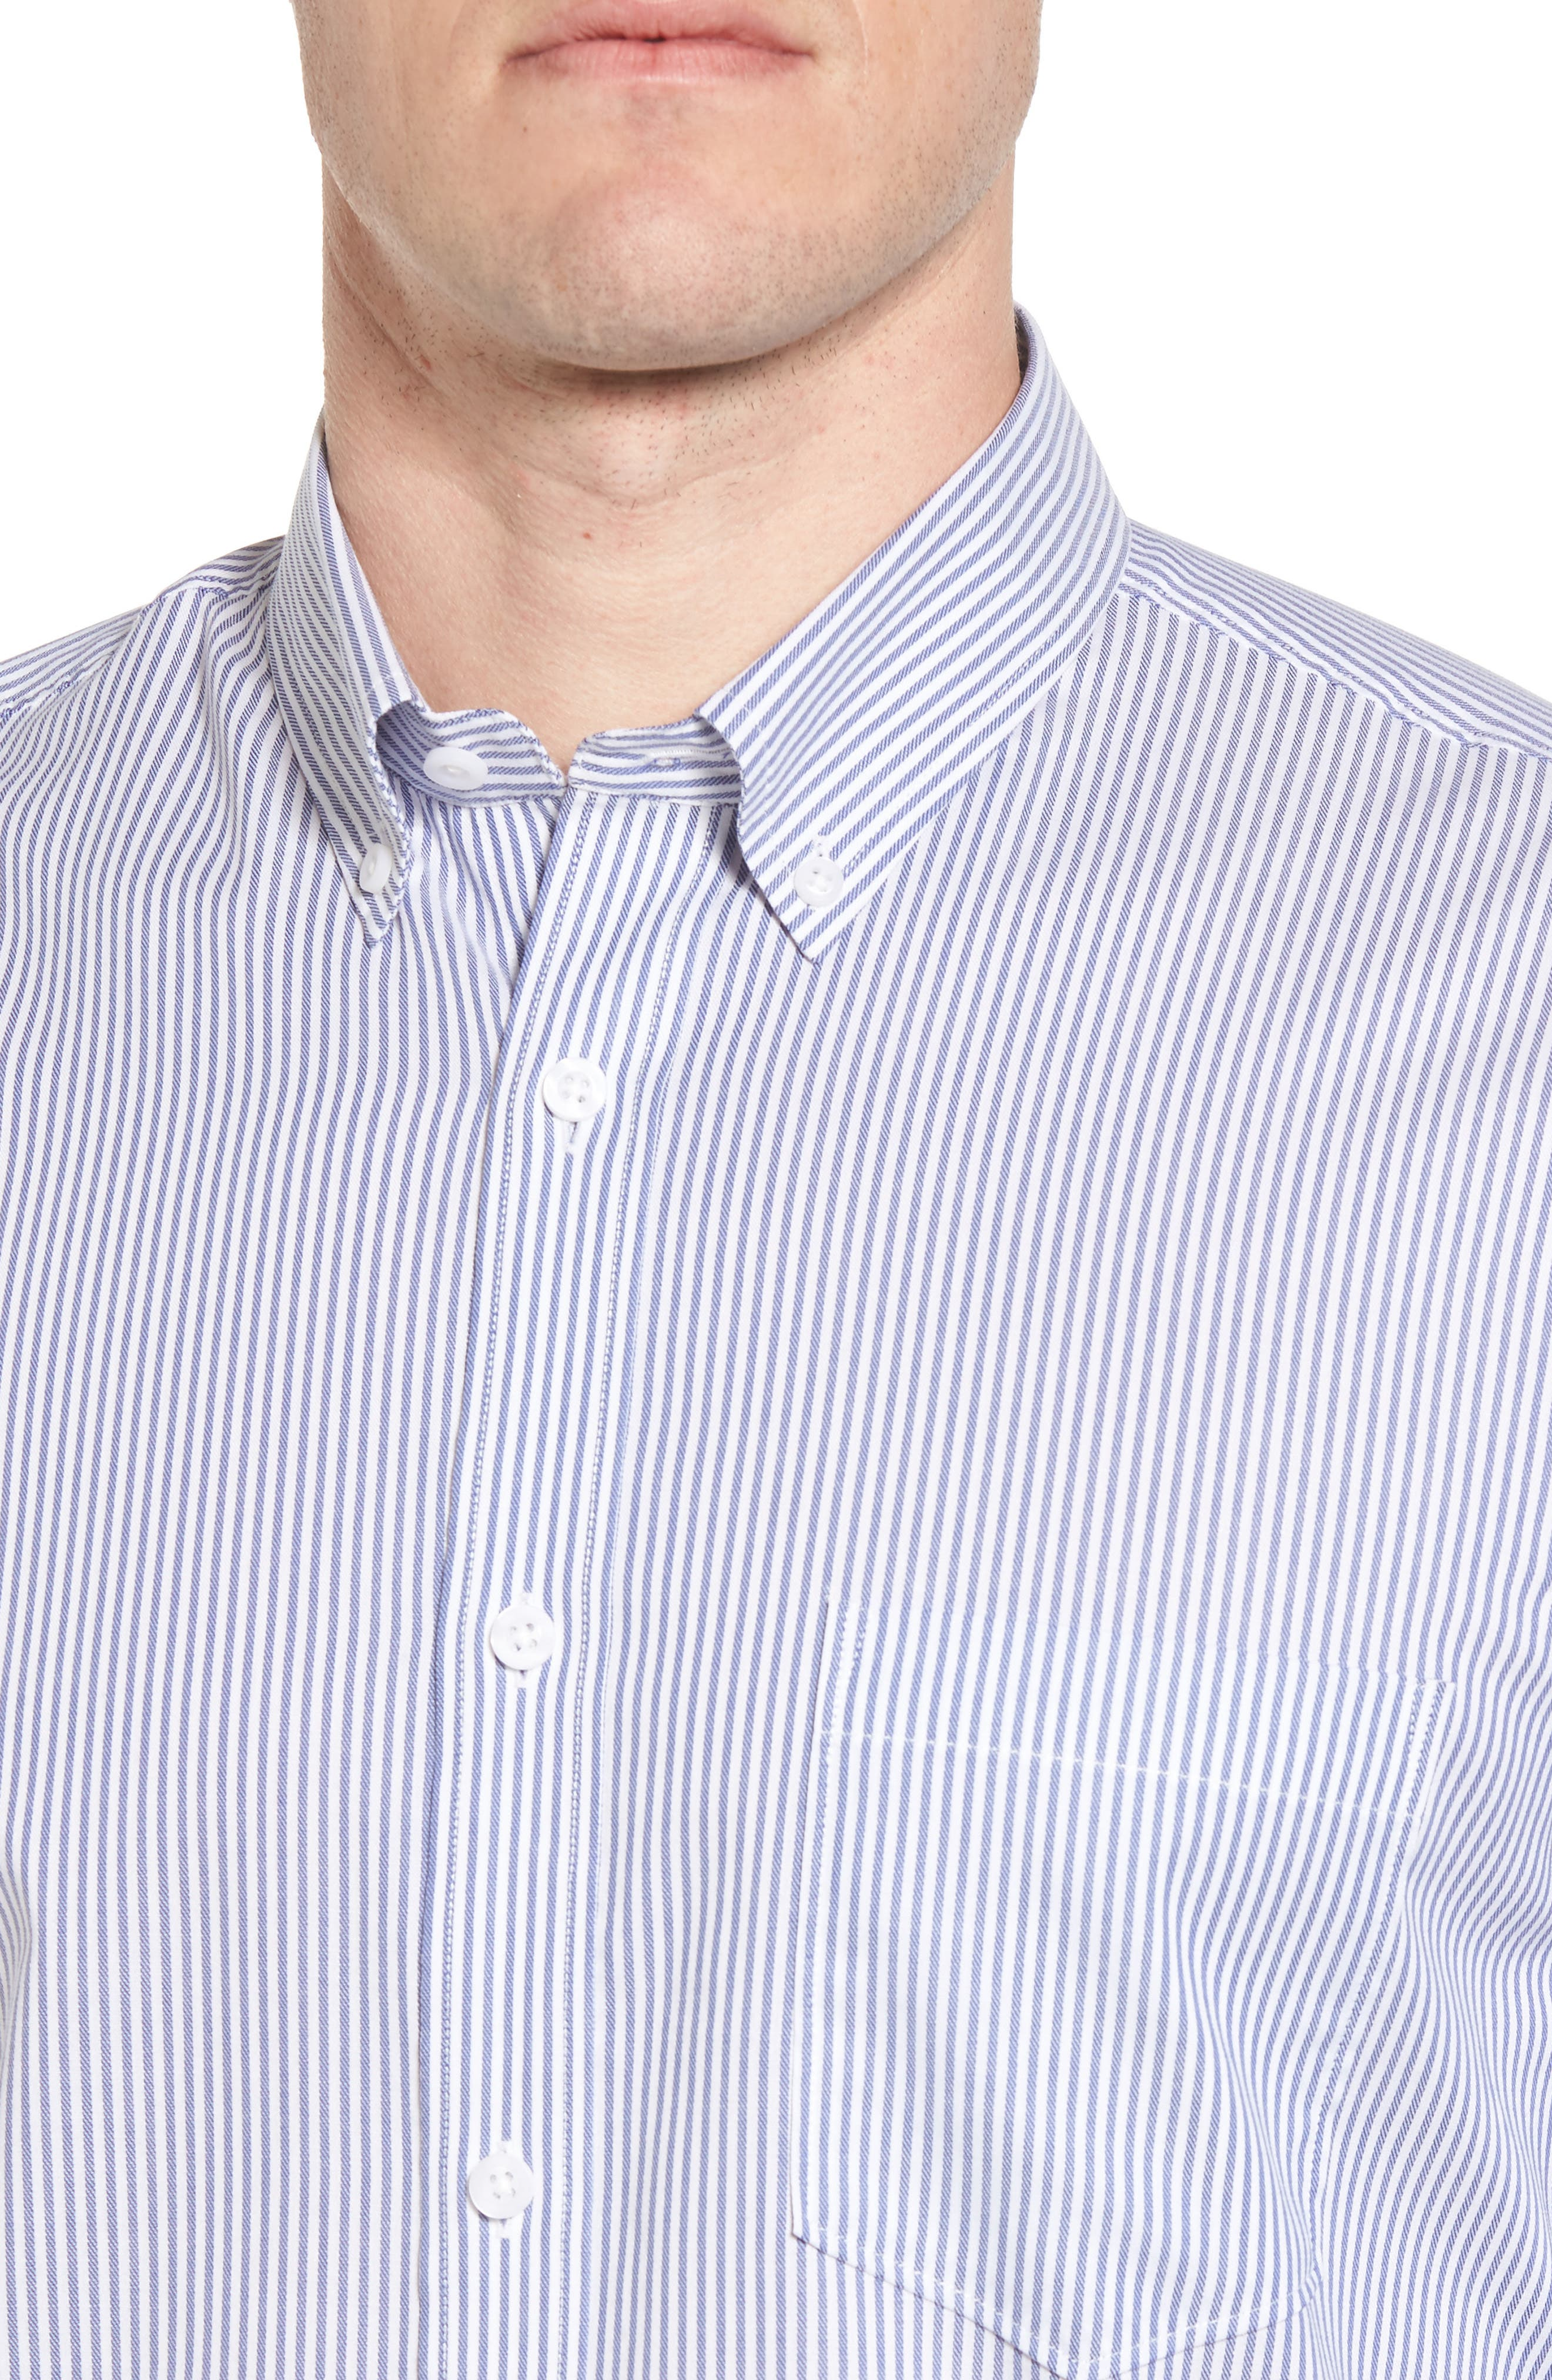 Tech-Smart Regular Fit Stripe Sport Shirt,                             Alternate thumbnail 2, color,                             Navy Iris White Stripe